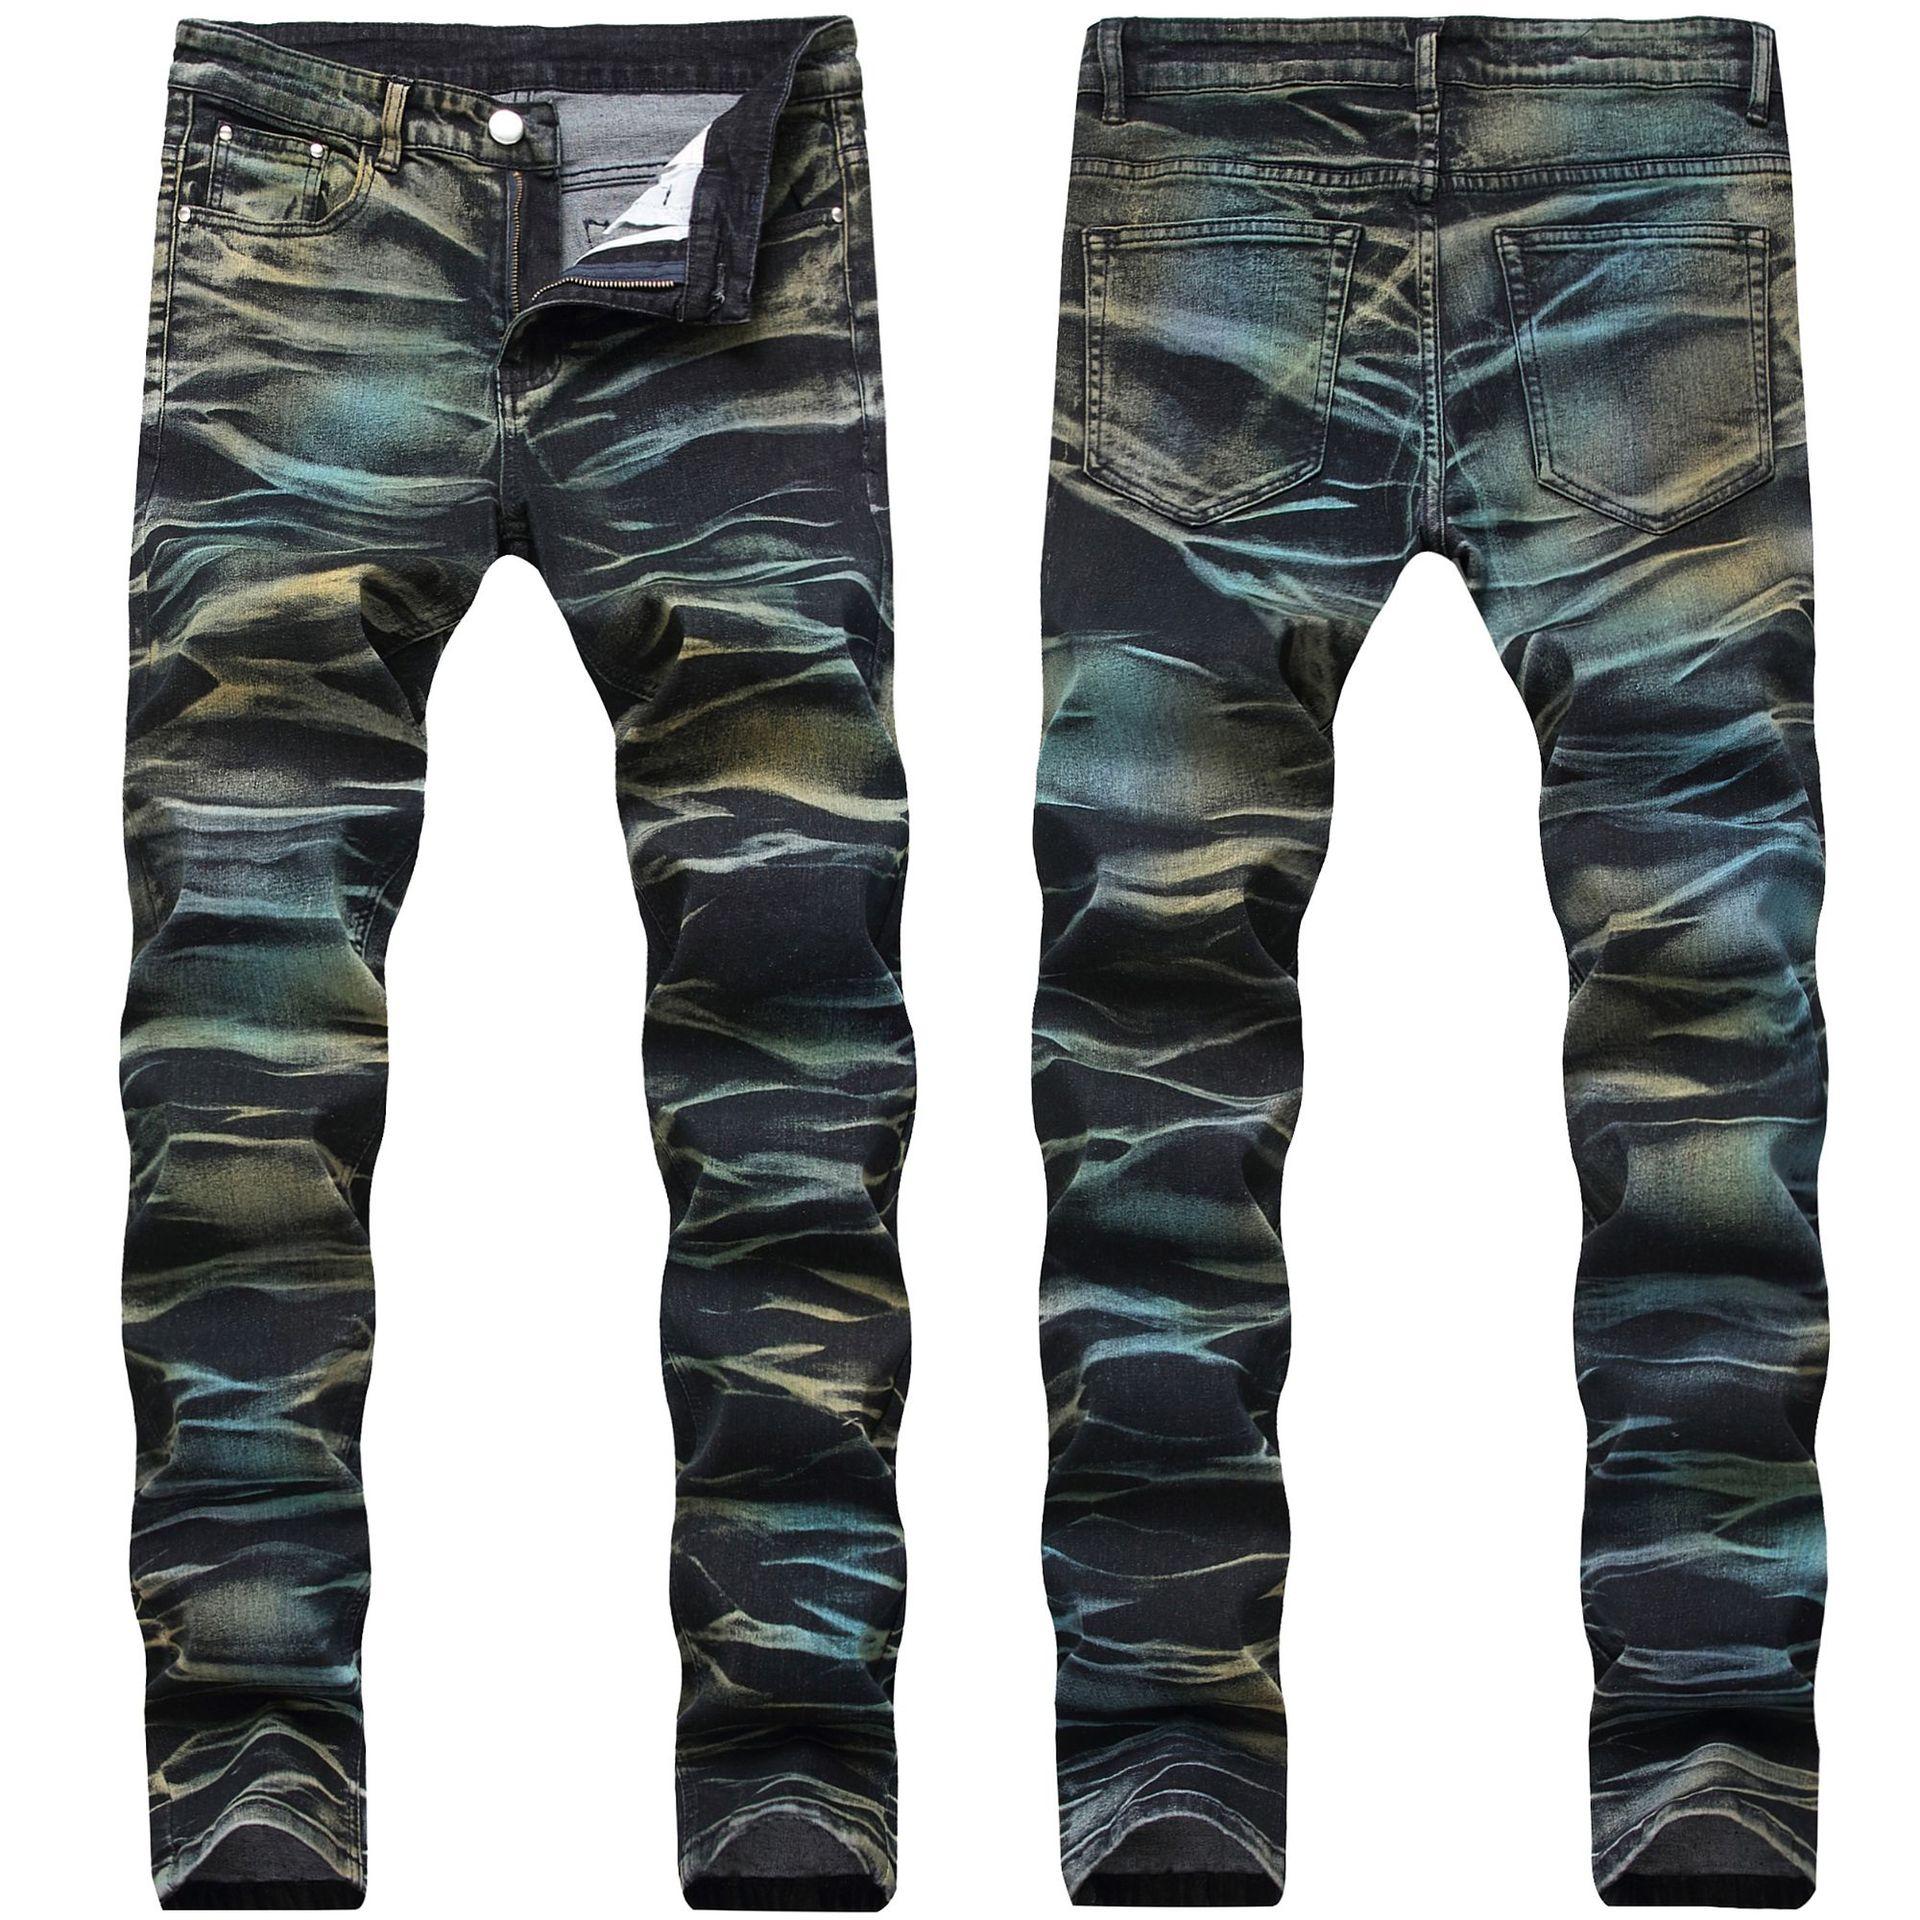 2019 Autumn New Jeans Men Classic Casual High Quality Straight Leg Male Casual Pants Multicolour Lines Slim Fit Denim Trousers